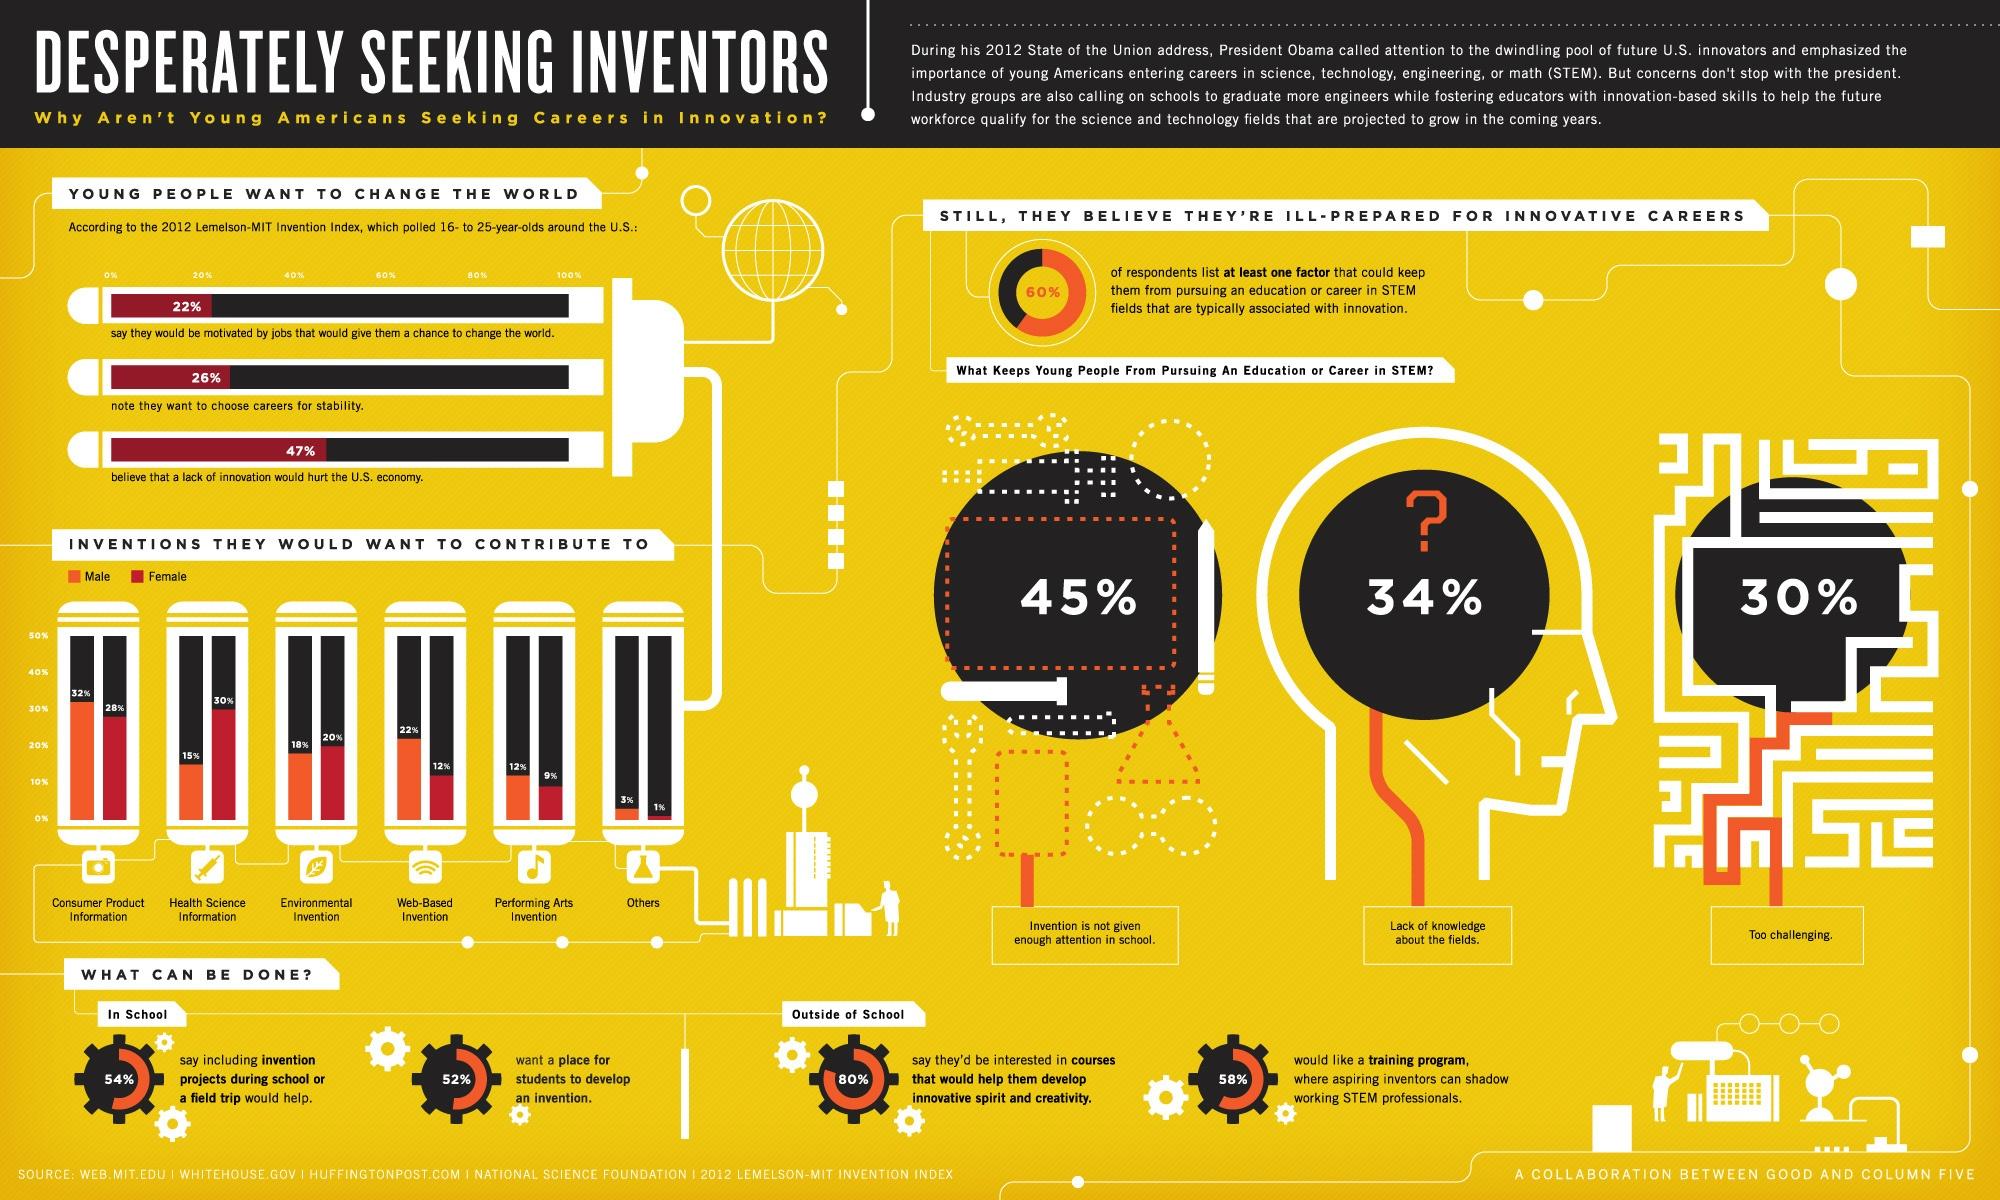 Desperately Seeking Inventors